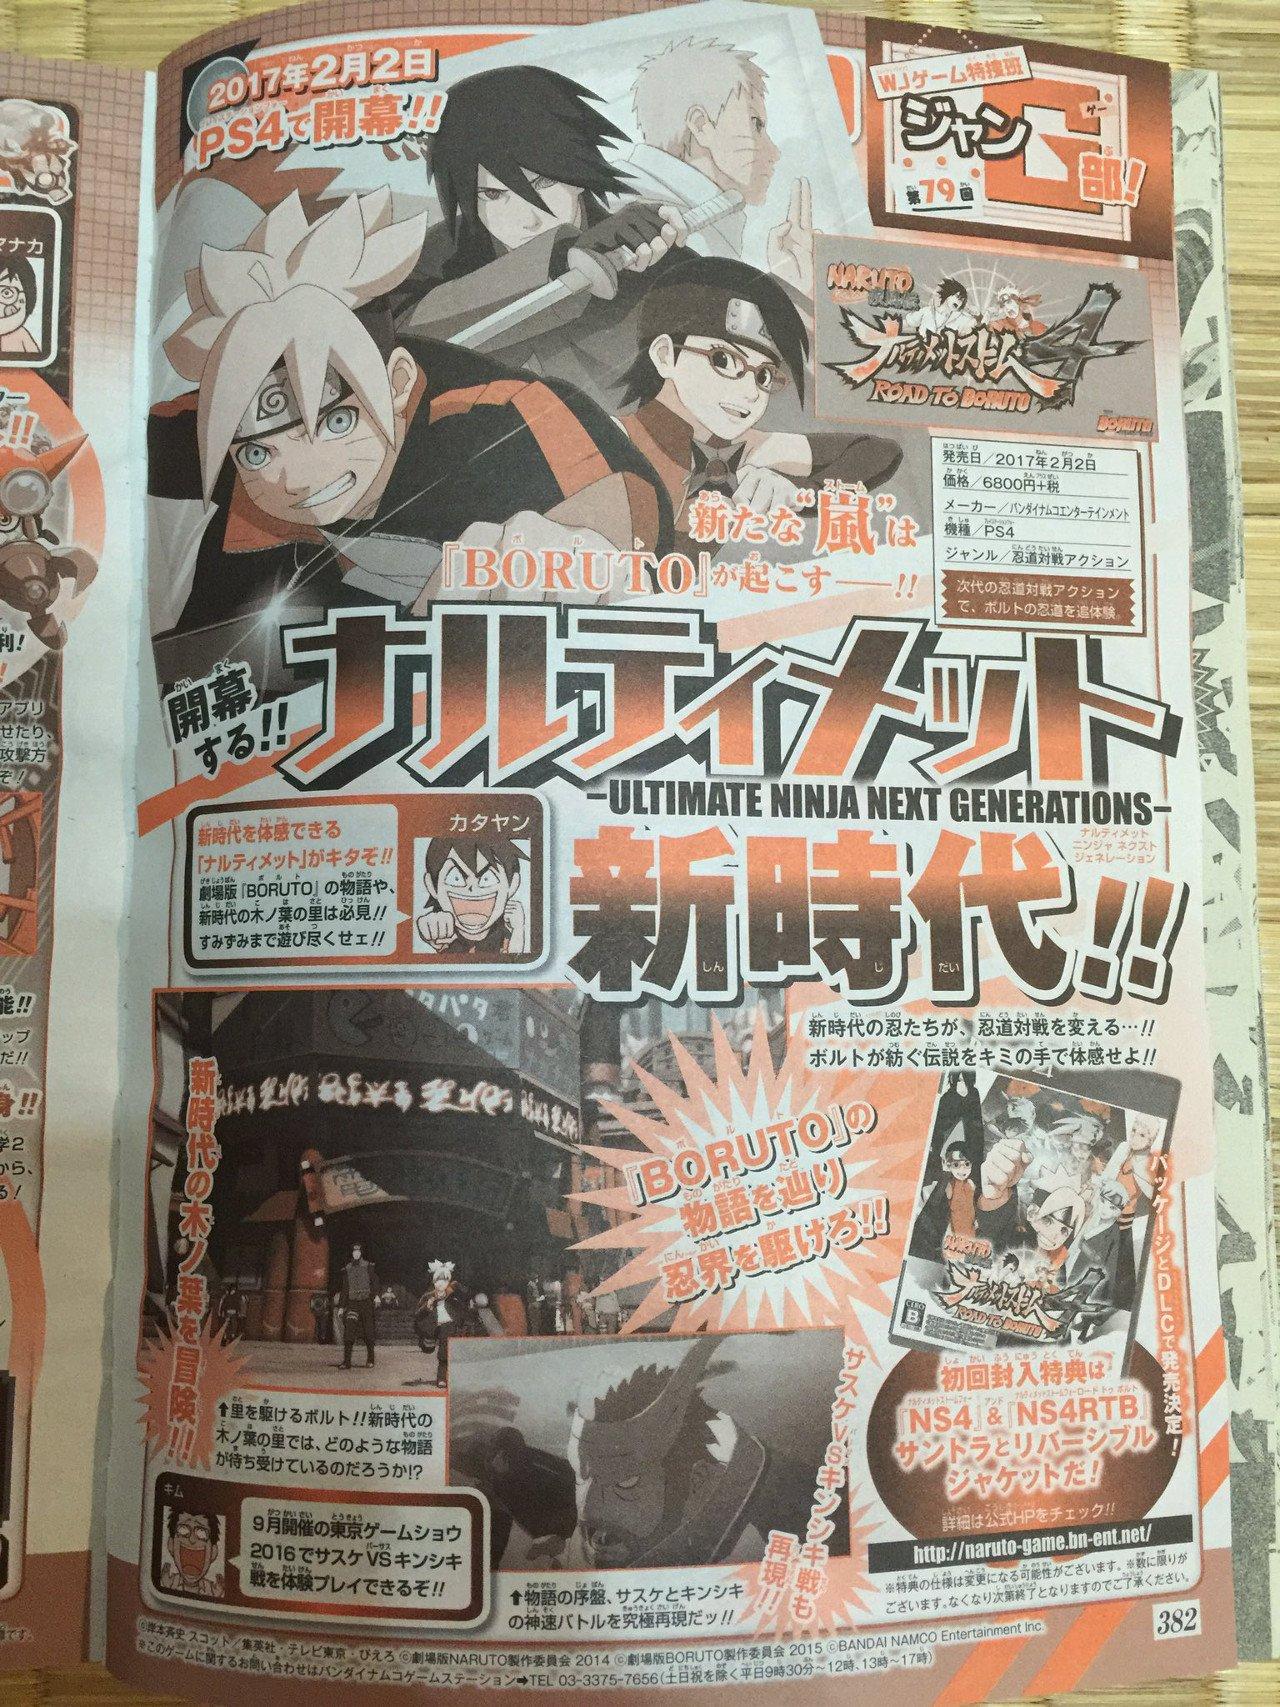 Naruto Shippuden Ultimate Ninja Storm 4 Road to Boruto annunciato